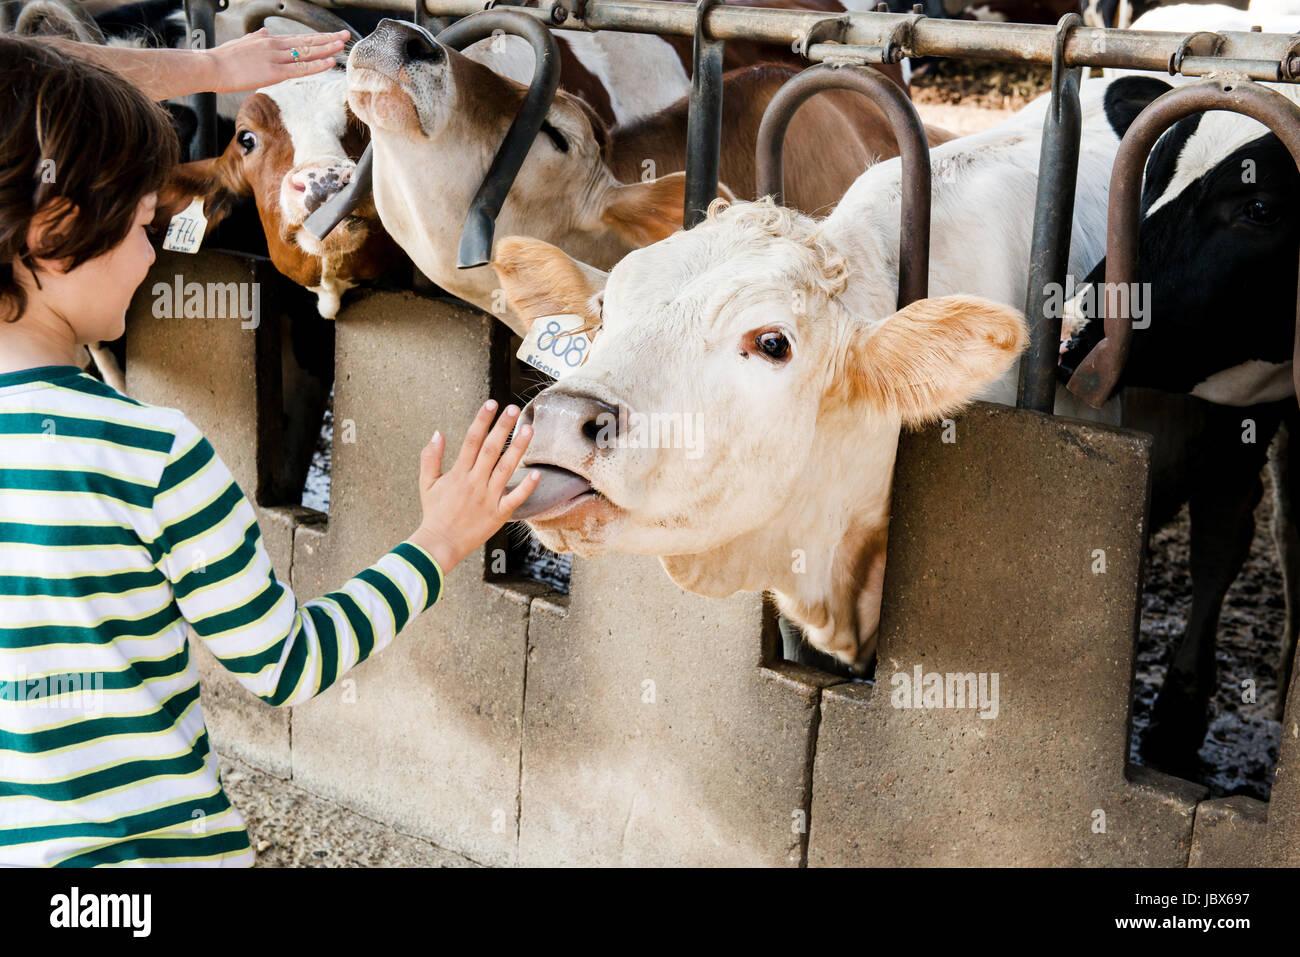 Cow licking boy's hand on organic dairy farm - Stock Image